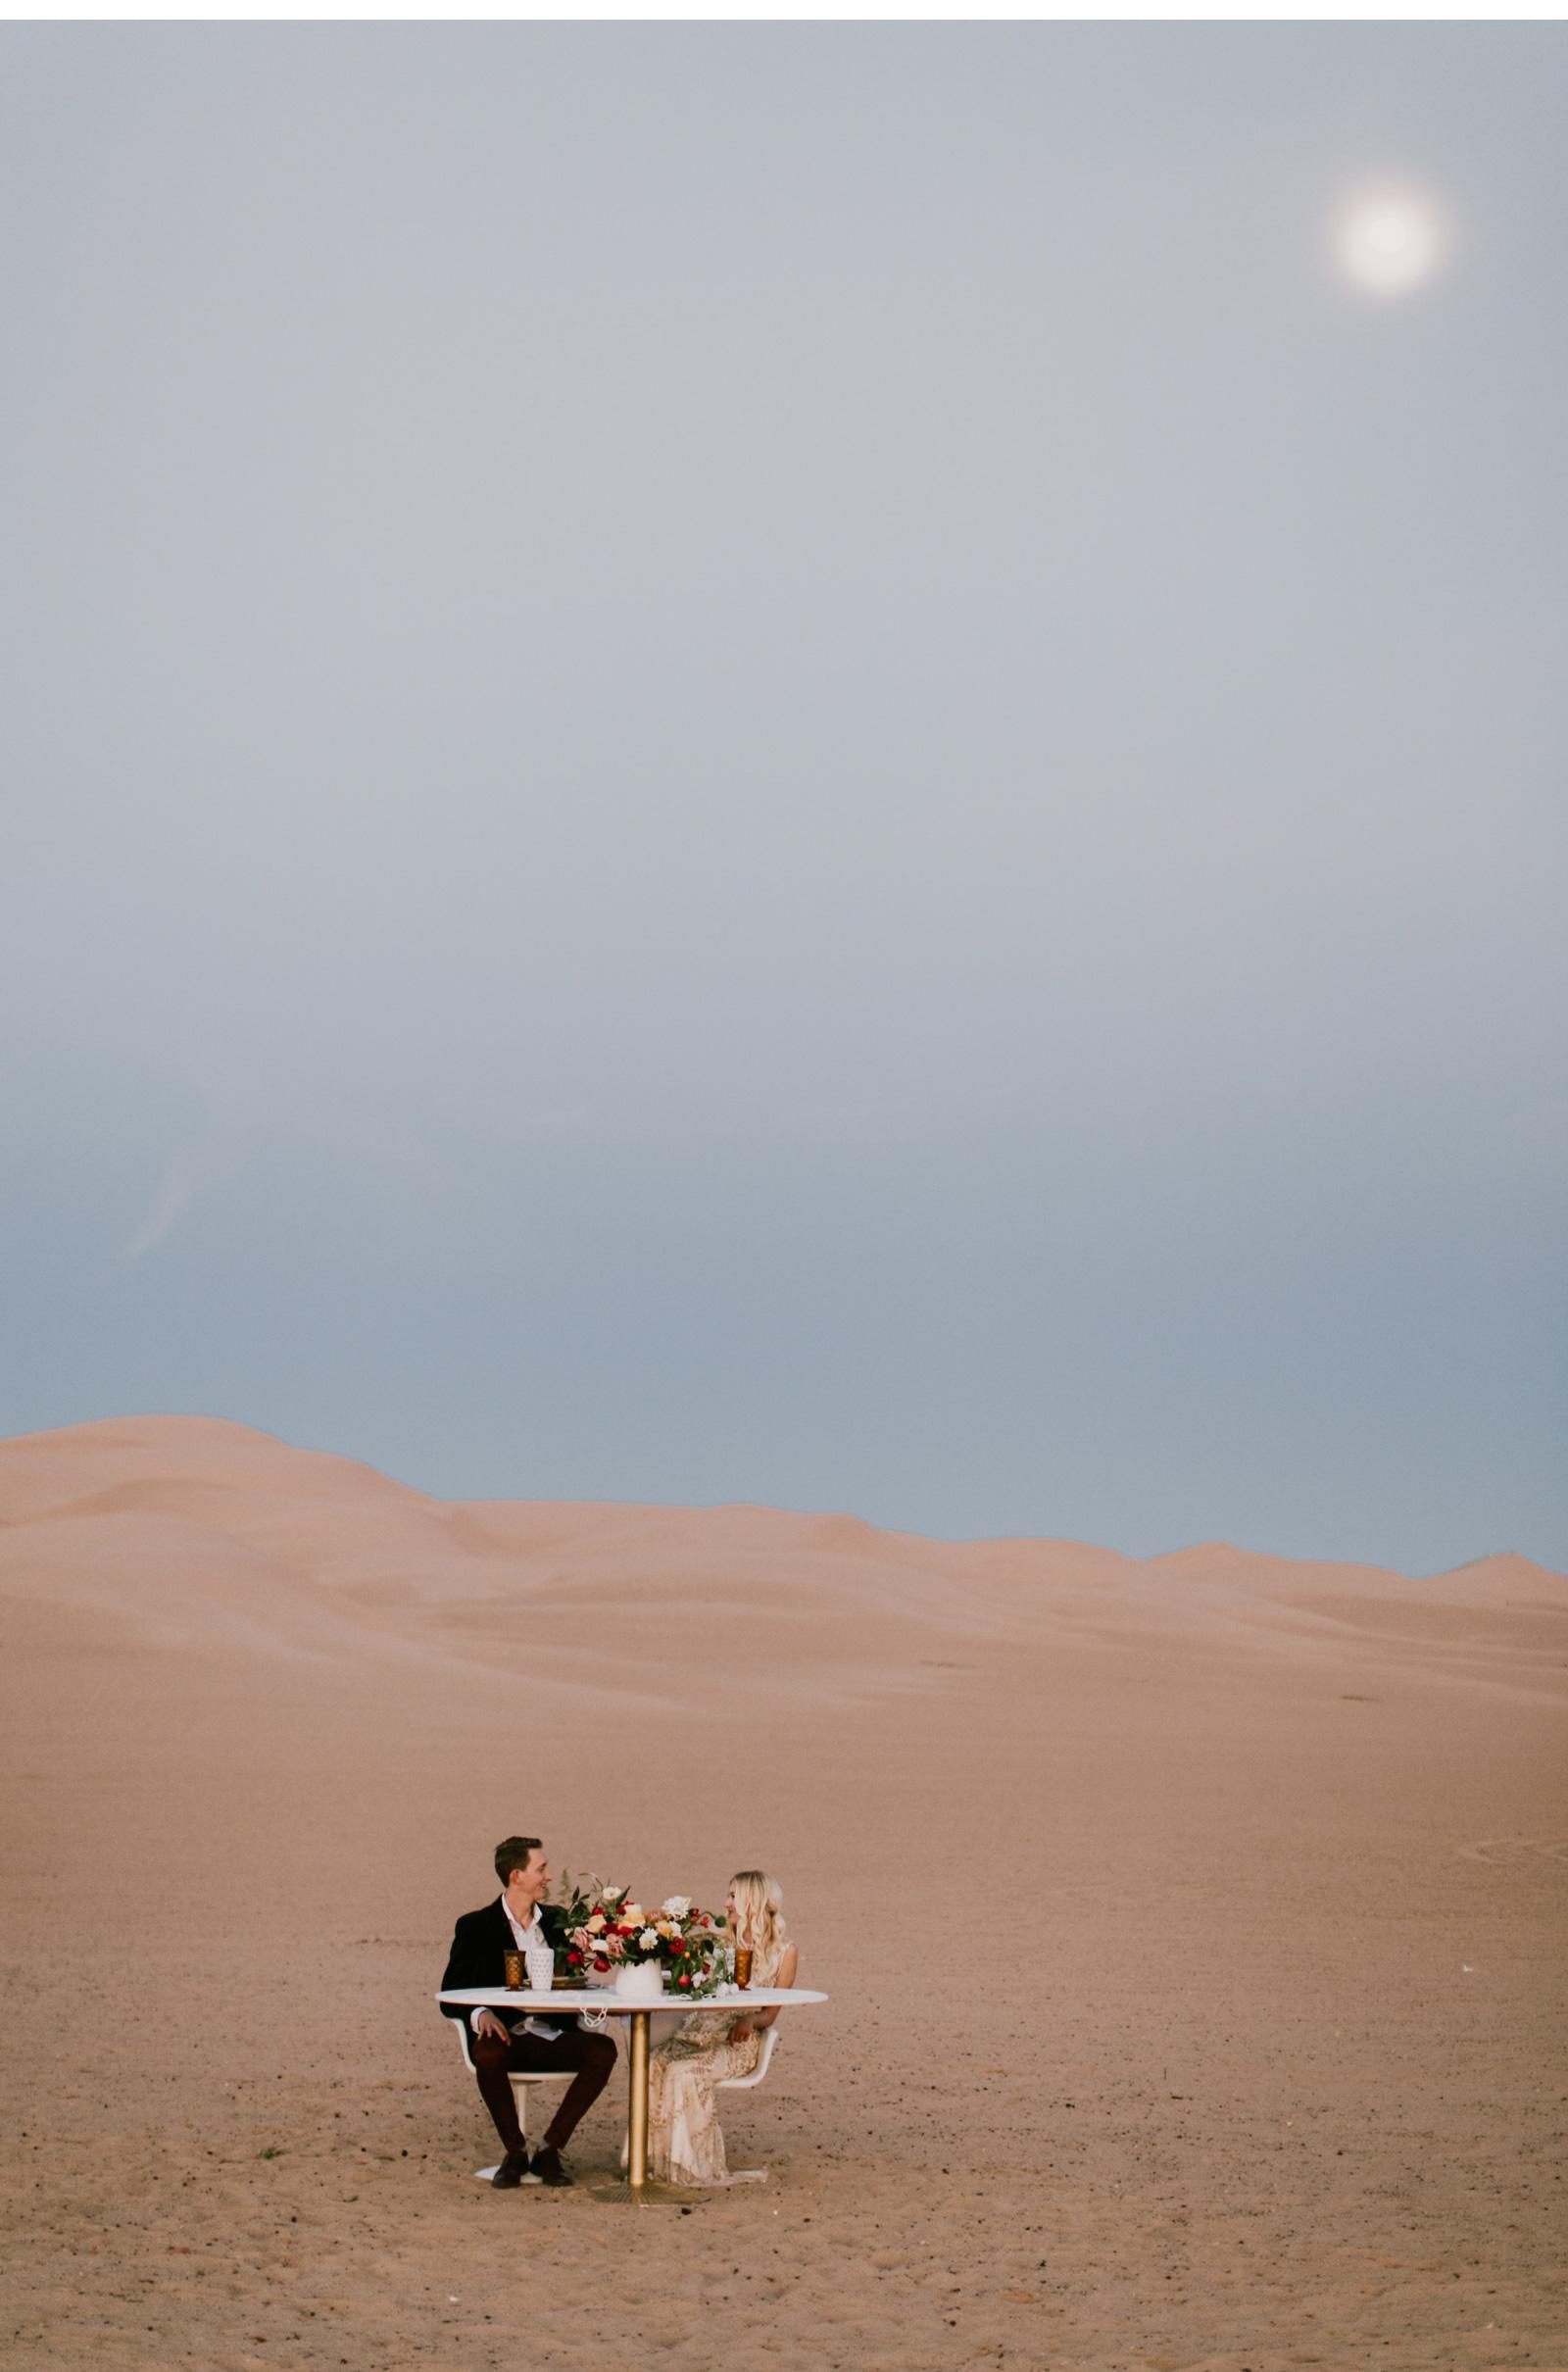 Michelle-Lillywhite-Dunes-Wedding-Green-Wedding-Shoes_01.jpg